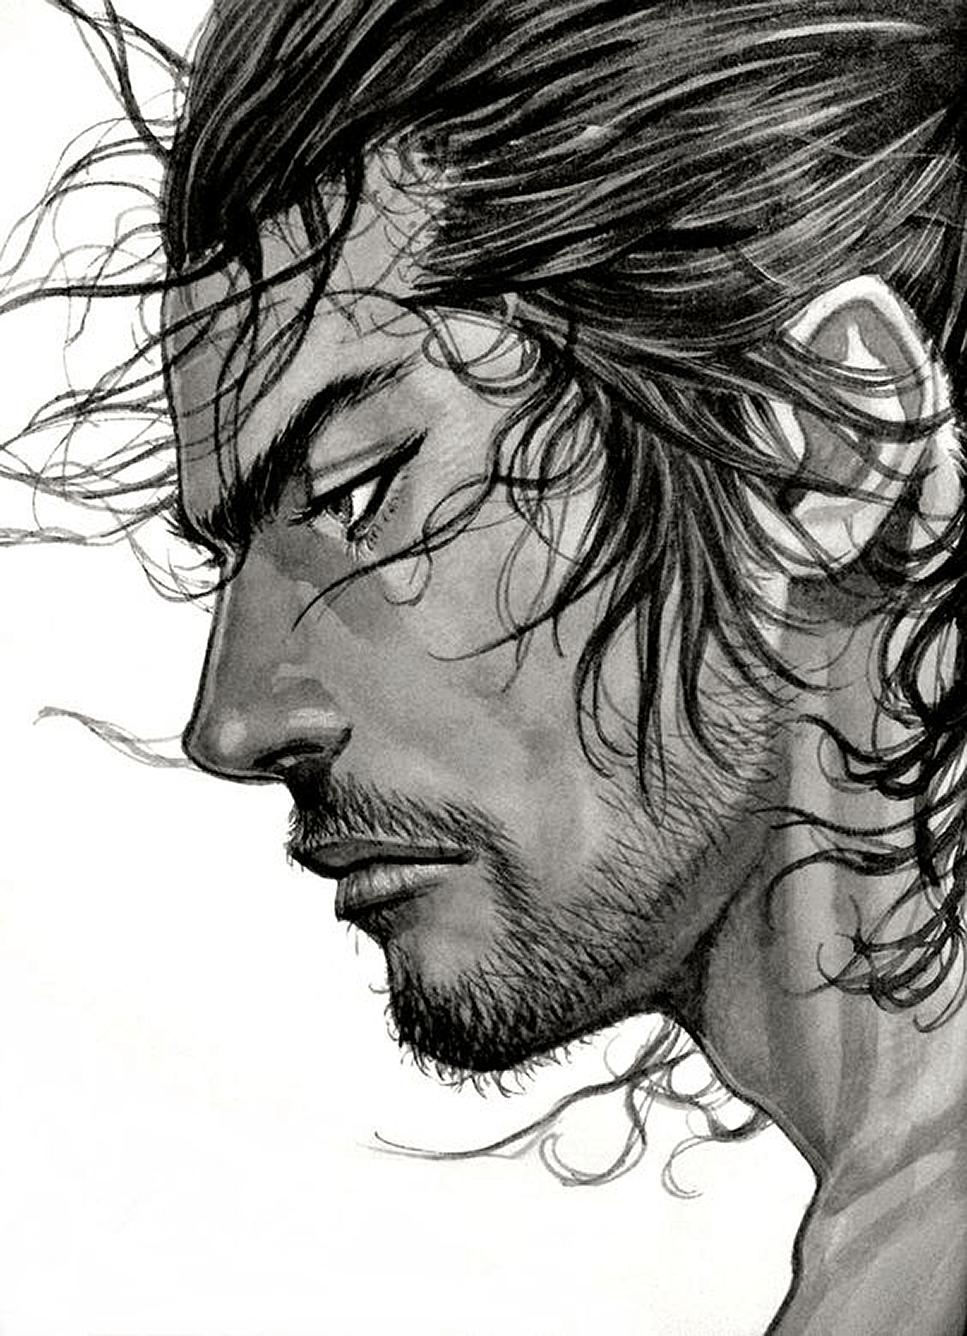 Vagabond Manga Wallpapers Top Free Vagabond Manga Backgrounds